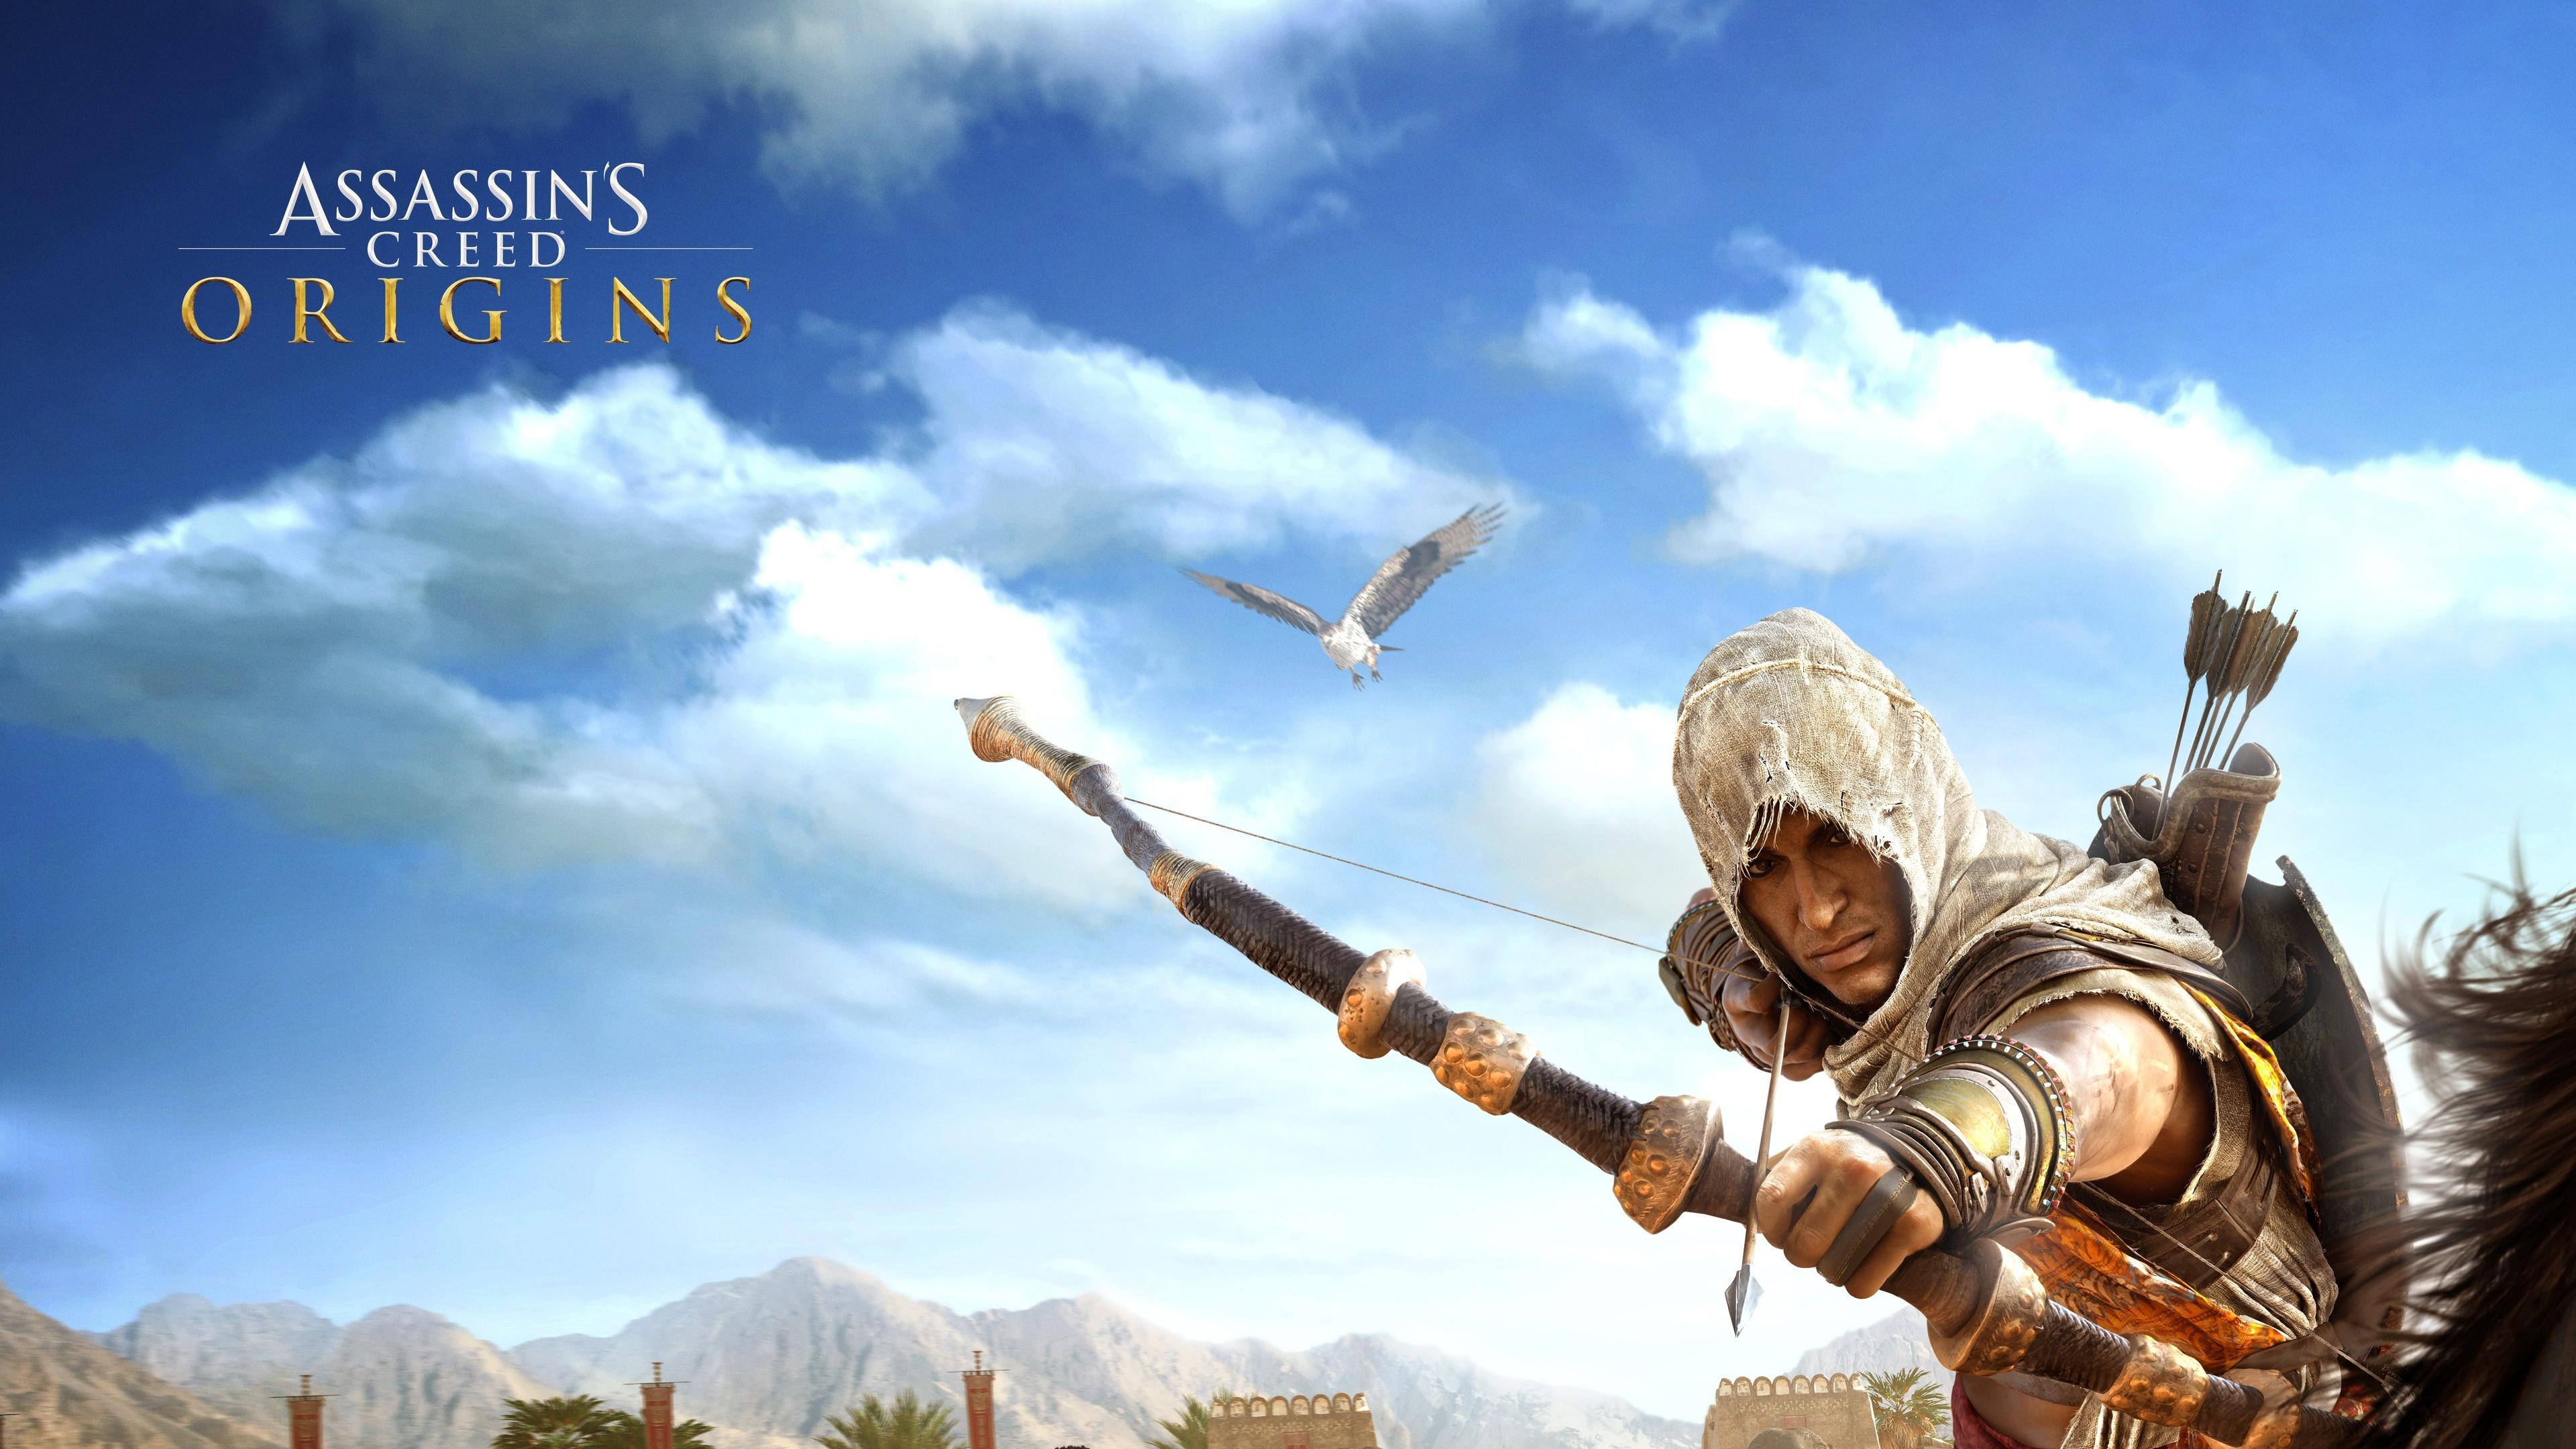 2048x2048 Sombra Overwatch Hd Ipad Air Hd 4k Wallpapers: Bayek Of Siwa Assassins Creed Origins 8k Xbox Games